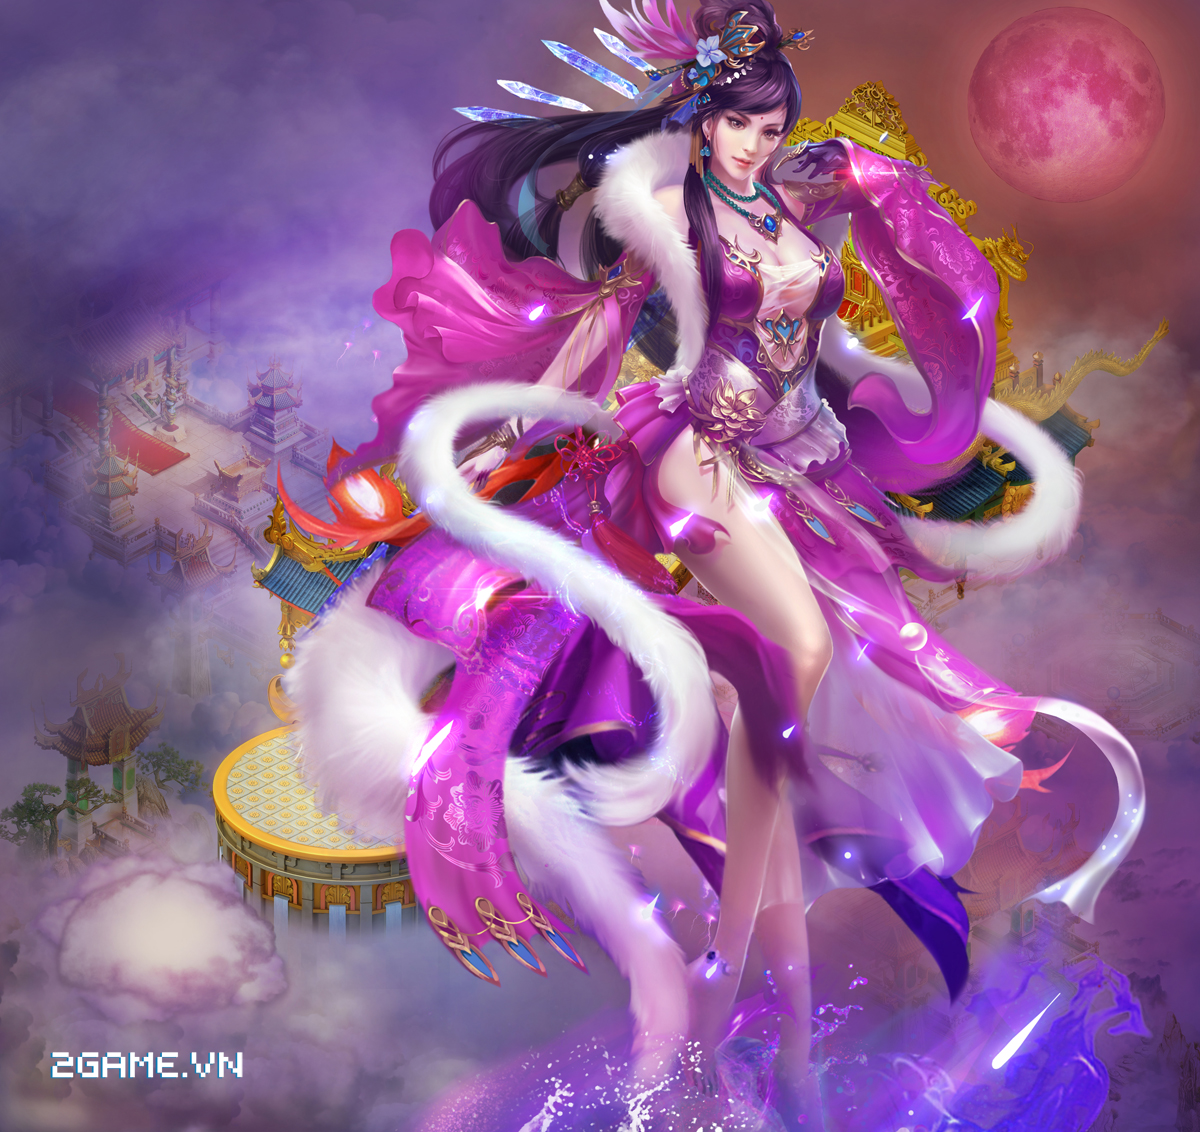 2game-anh-webgame-phong-than-chi-no-online-6.jpg (1200×1132)